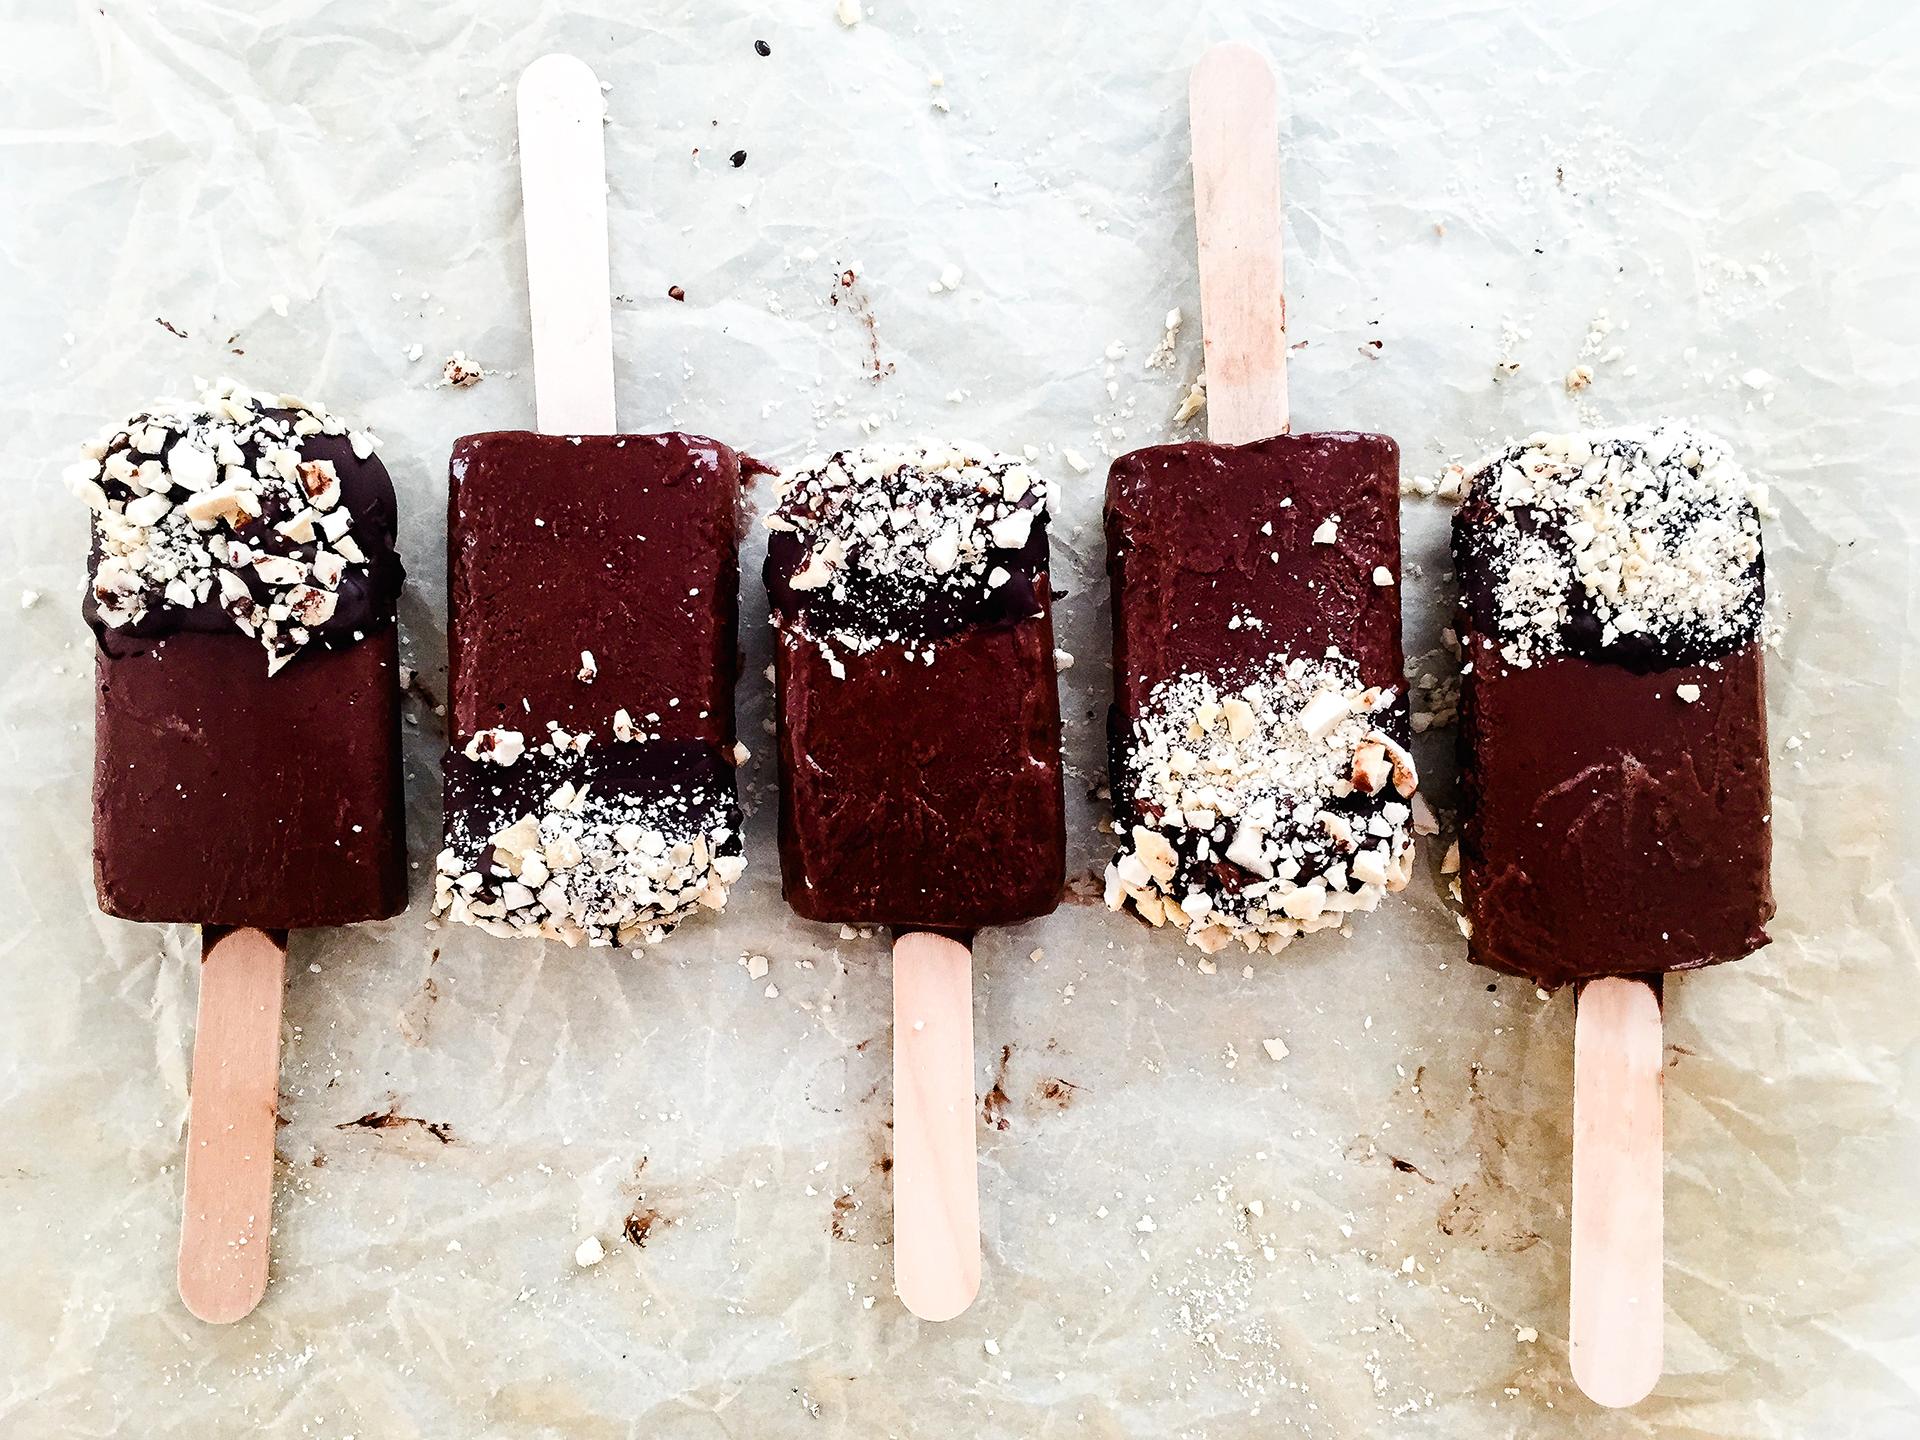 Vegan High Fibre Dark Chocolate and Banana Popsicles Preview